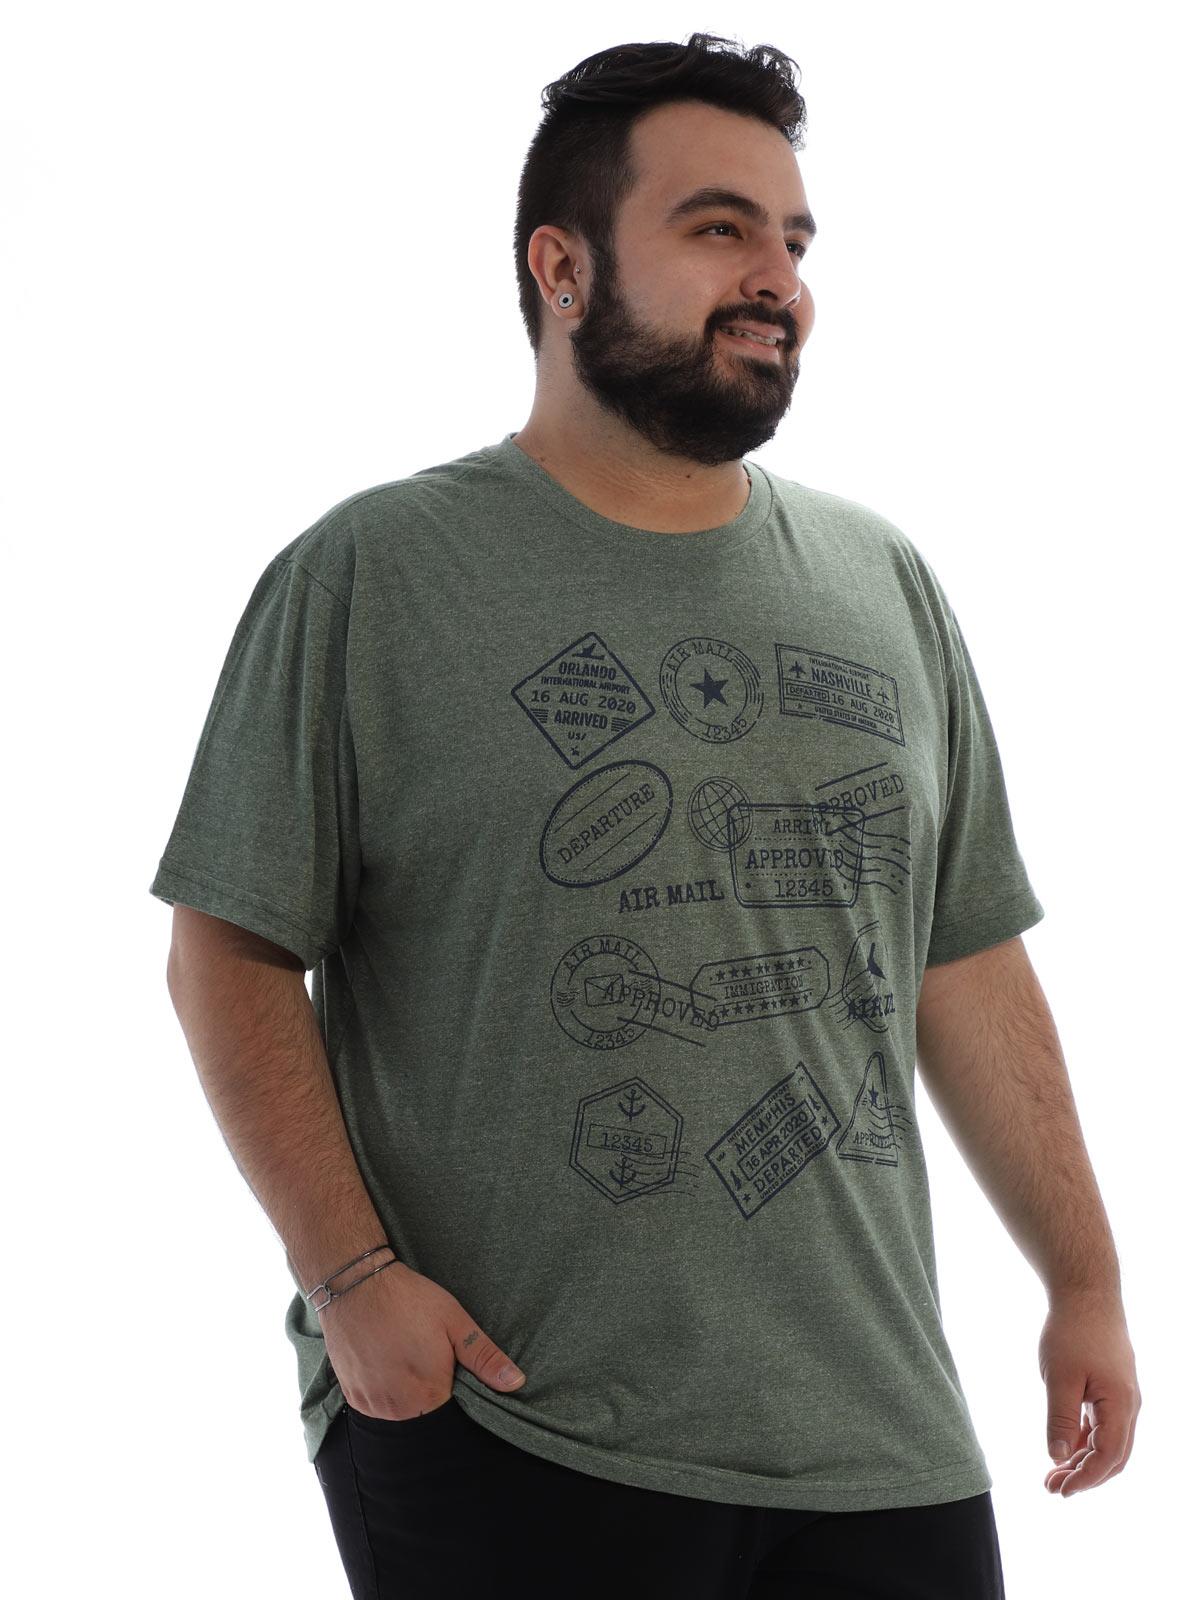 Camiseta Plus Size Masculina Algodão Mouline Nature Militar